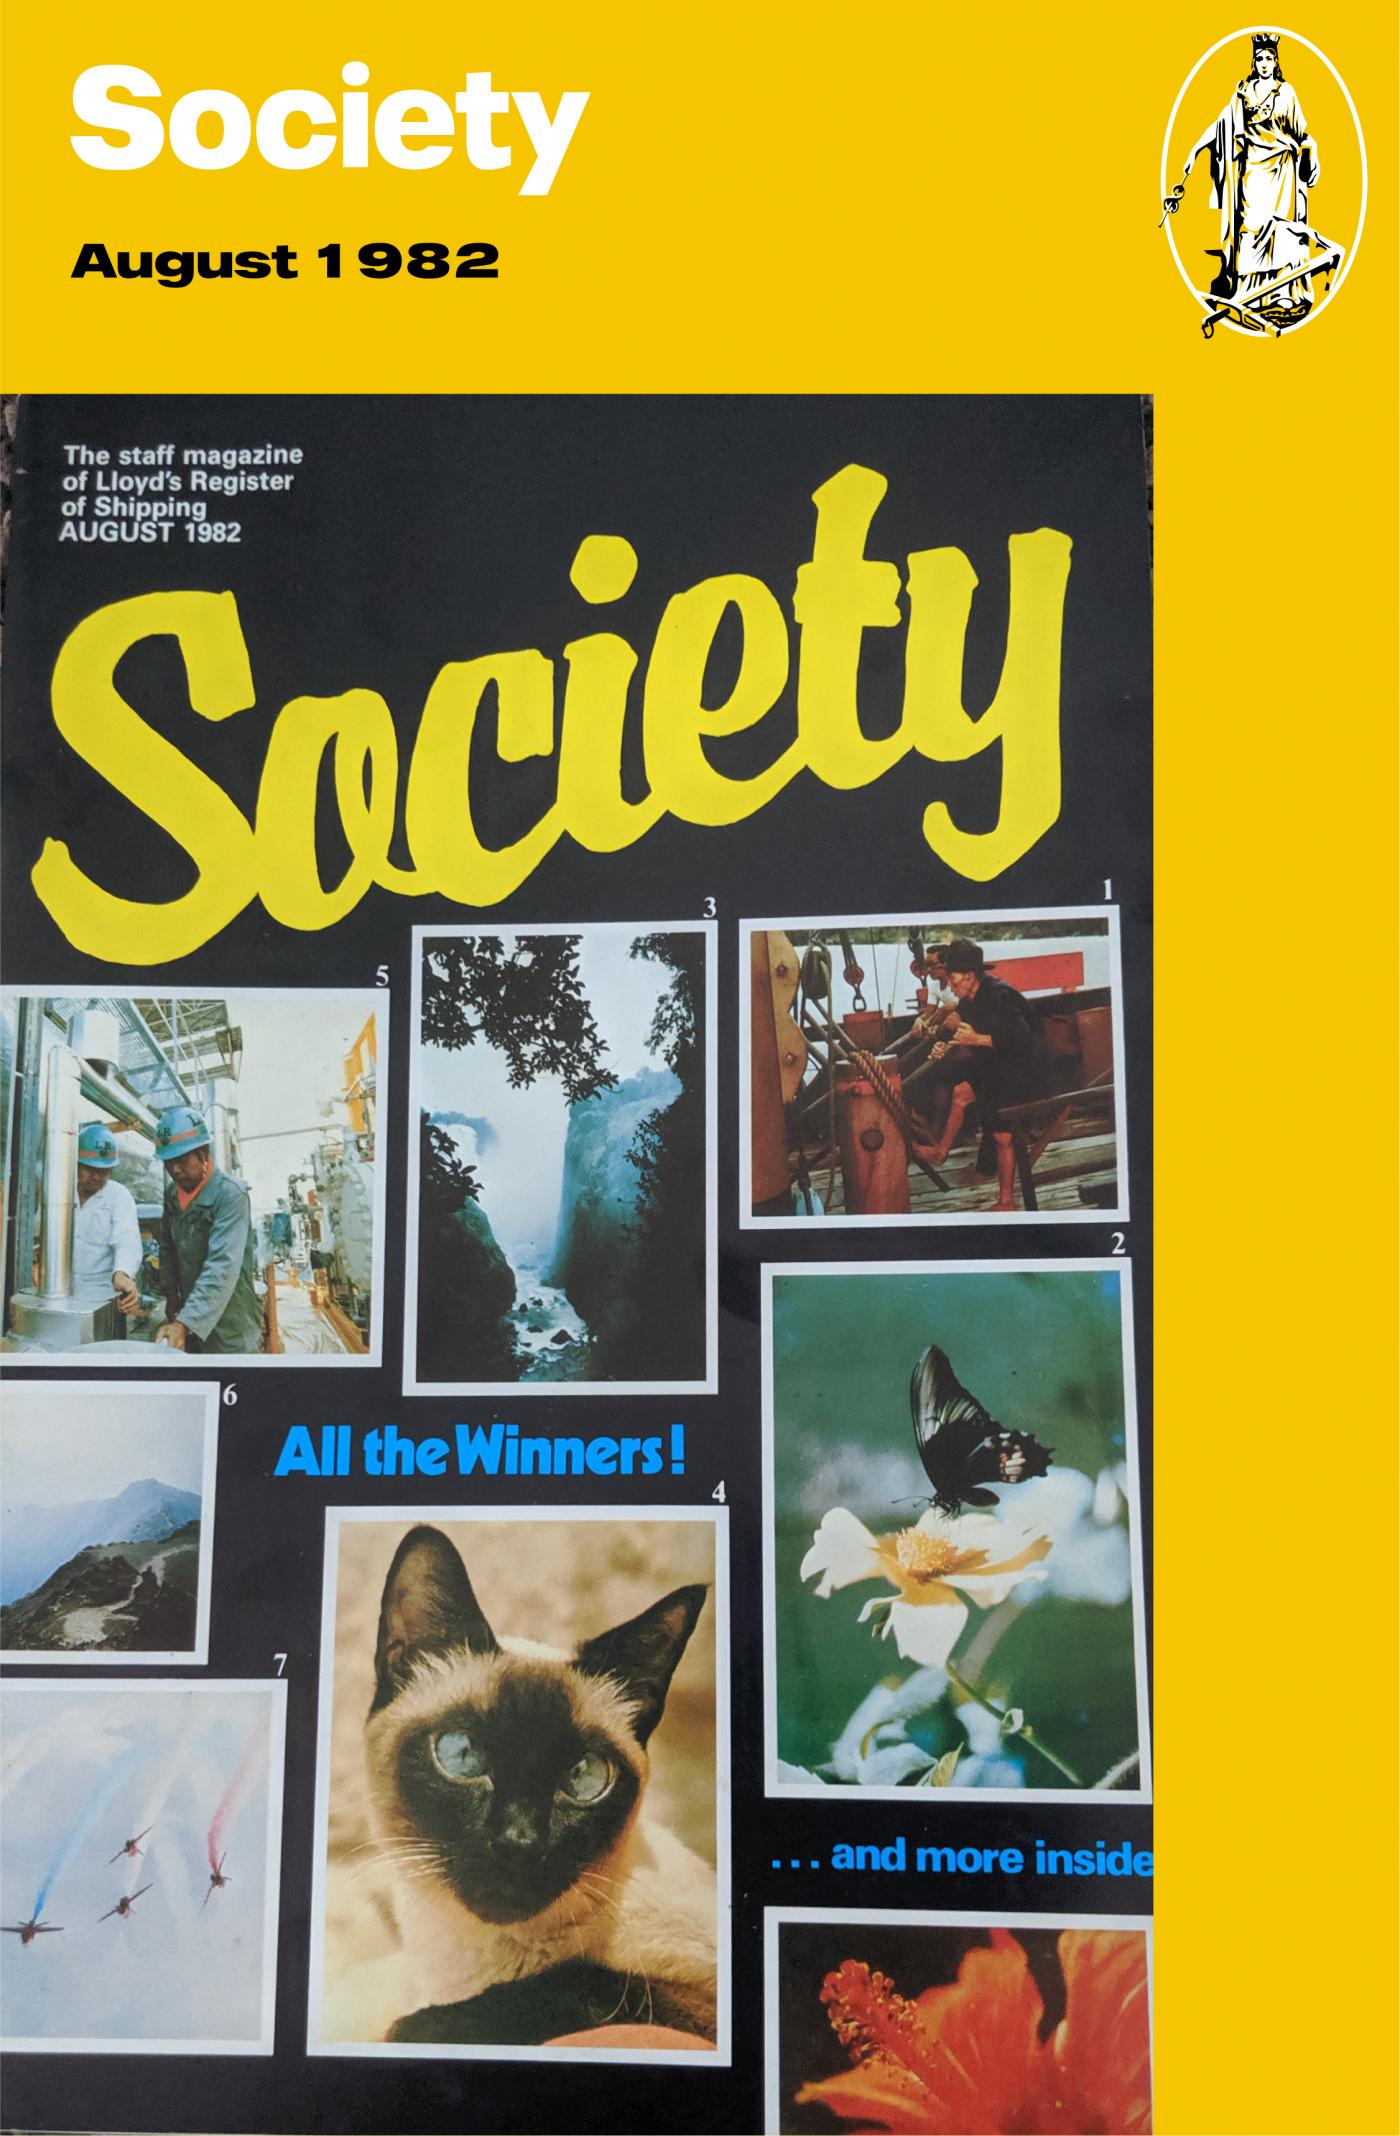 Society blog August 1982